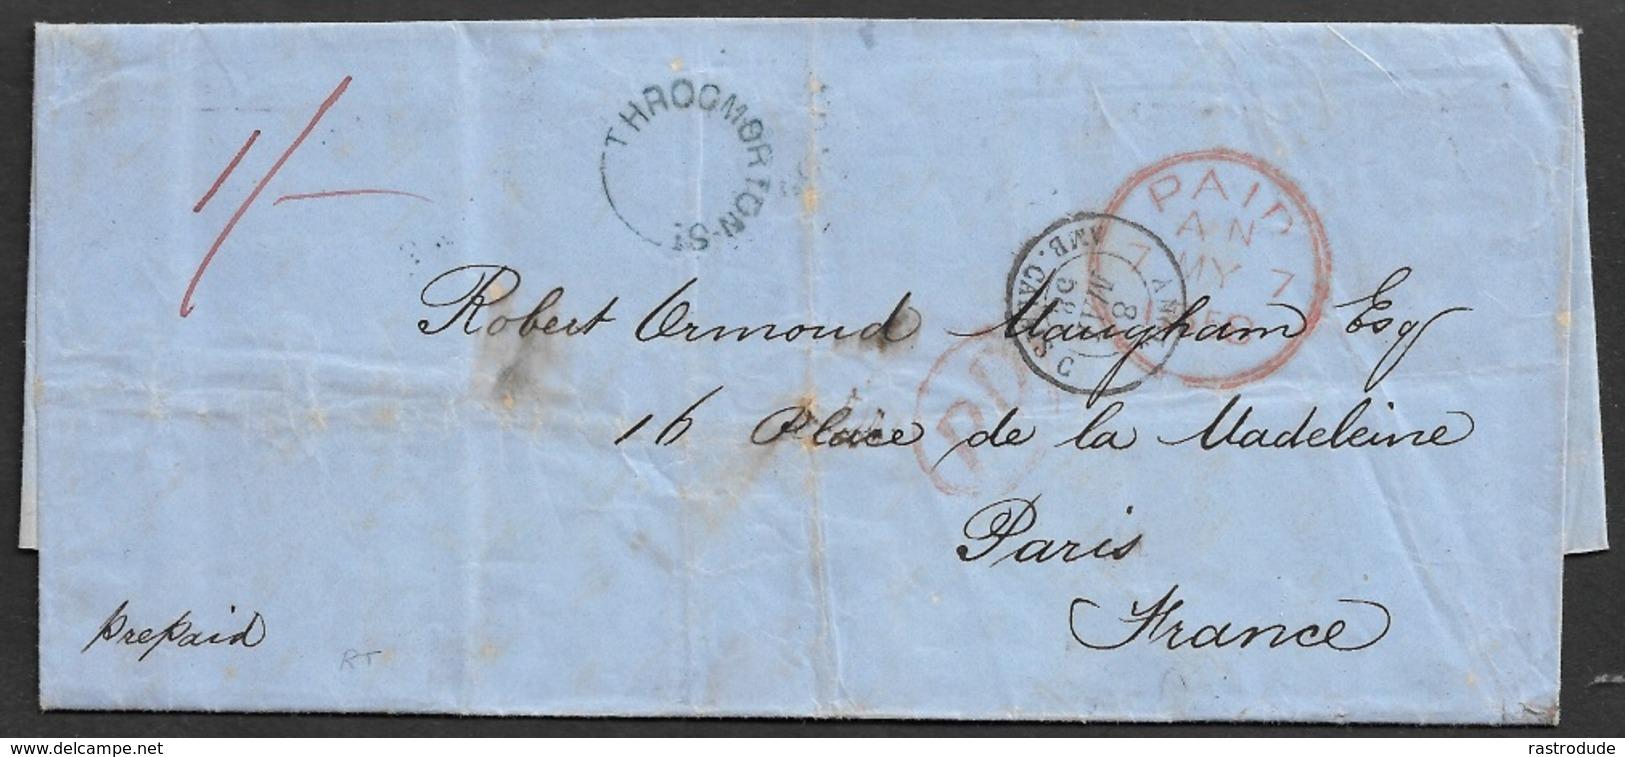 1858 ENTIRE - LONDON THROGMORTON ST.to PARIS Over CALAIS - PREPAID - Postmark Collection